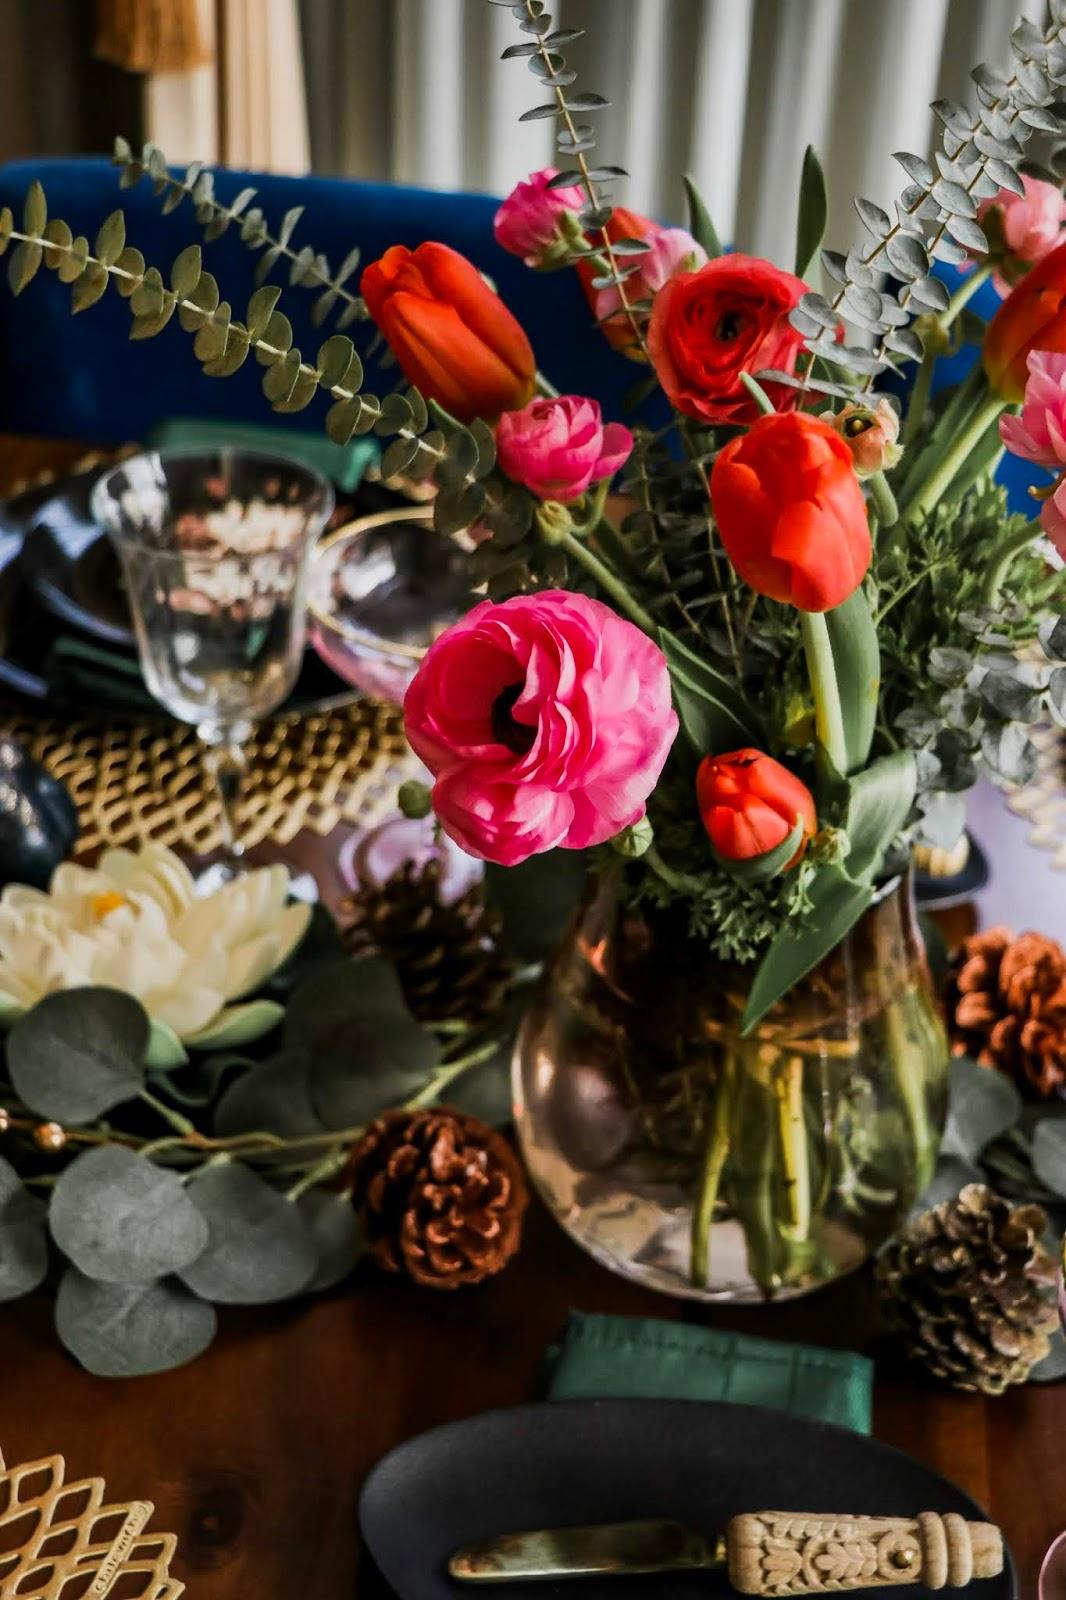 holiday tablescape, floral decor, table setup for holidays, DIY pumpkin table setup, black and green tablescape for the holidays, DIY tablescape, painted pumpkins, coupe, myriad musings, Saumya Shiohare